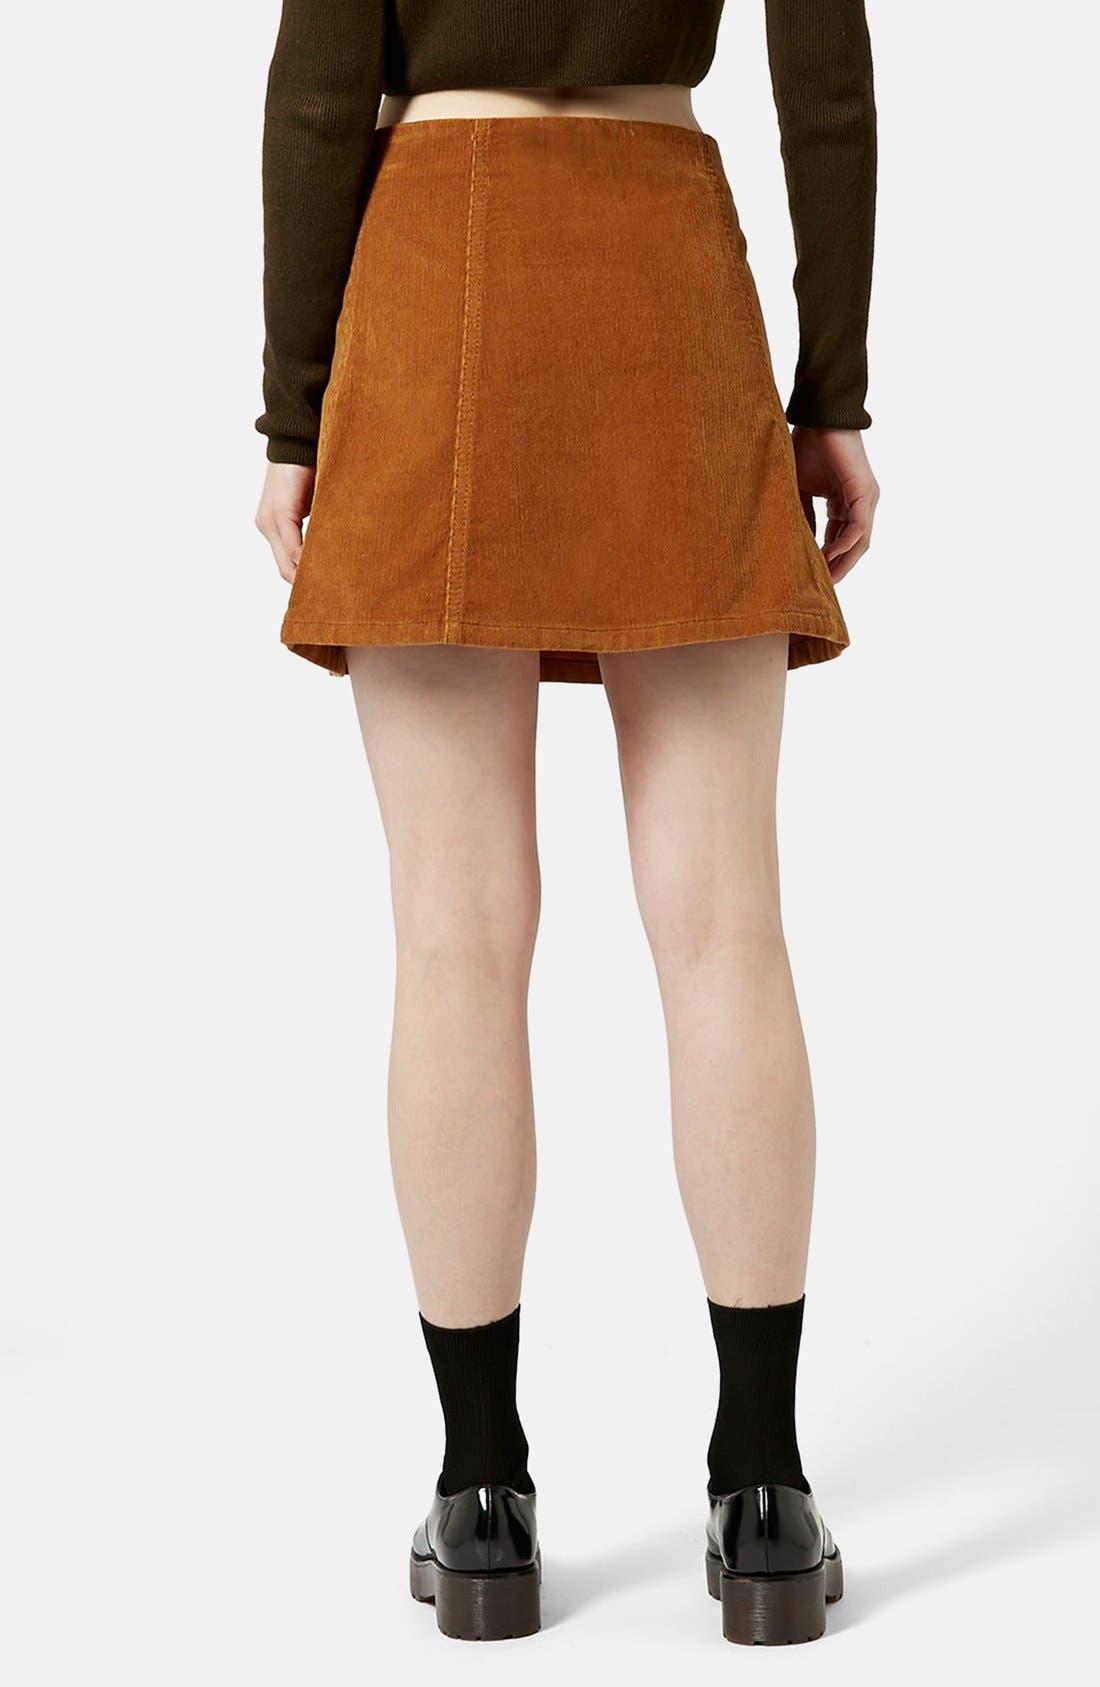 TOPSHOP, A-Line Corduroy Skirt, Alternate thumbnail 2, color, 210